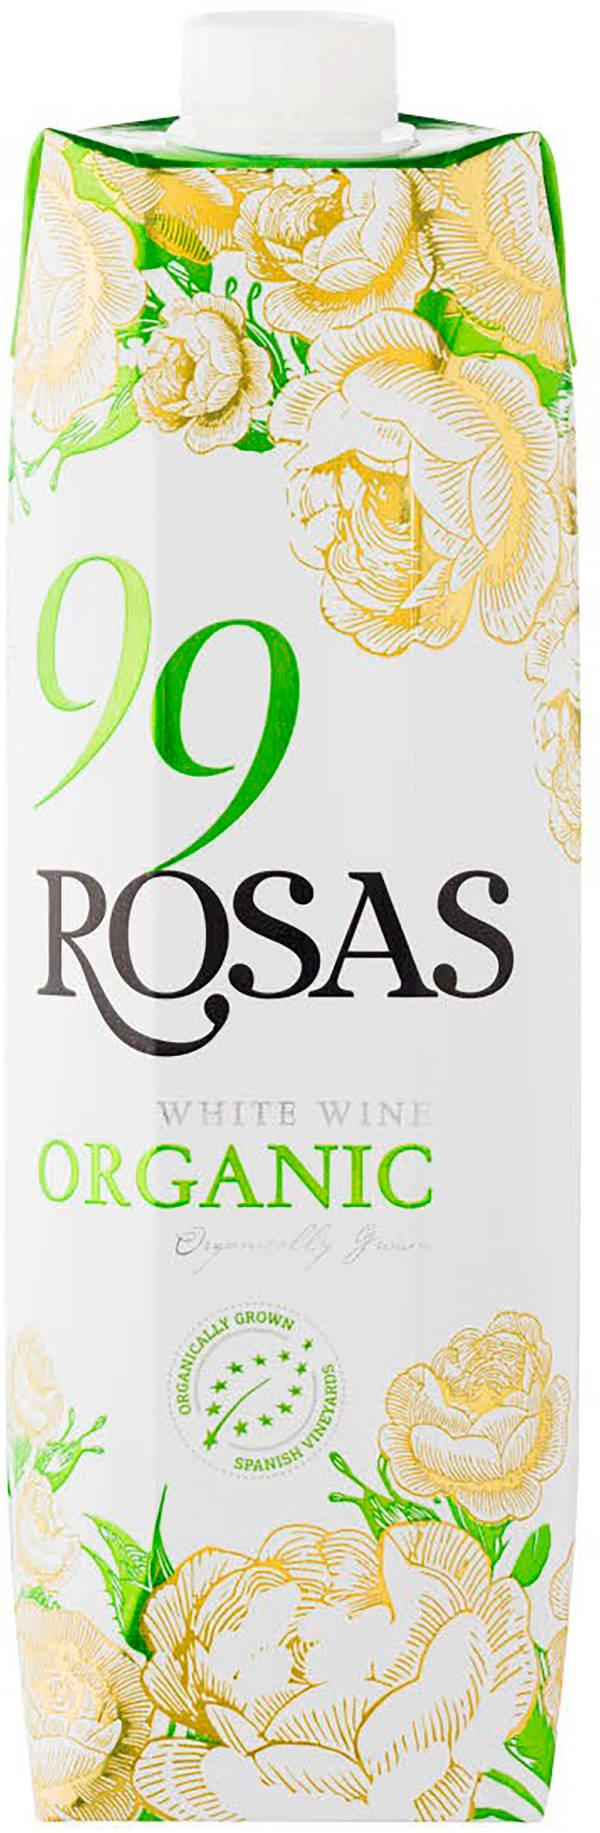 99 Rosas Organic White Wine 2020 carton package